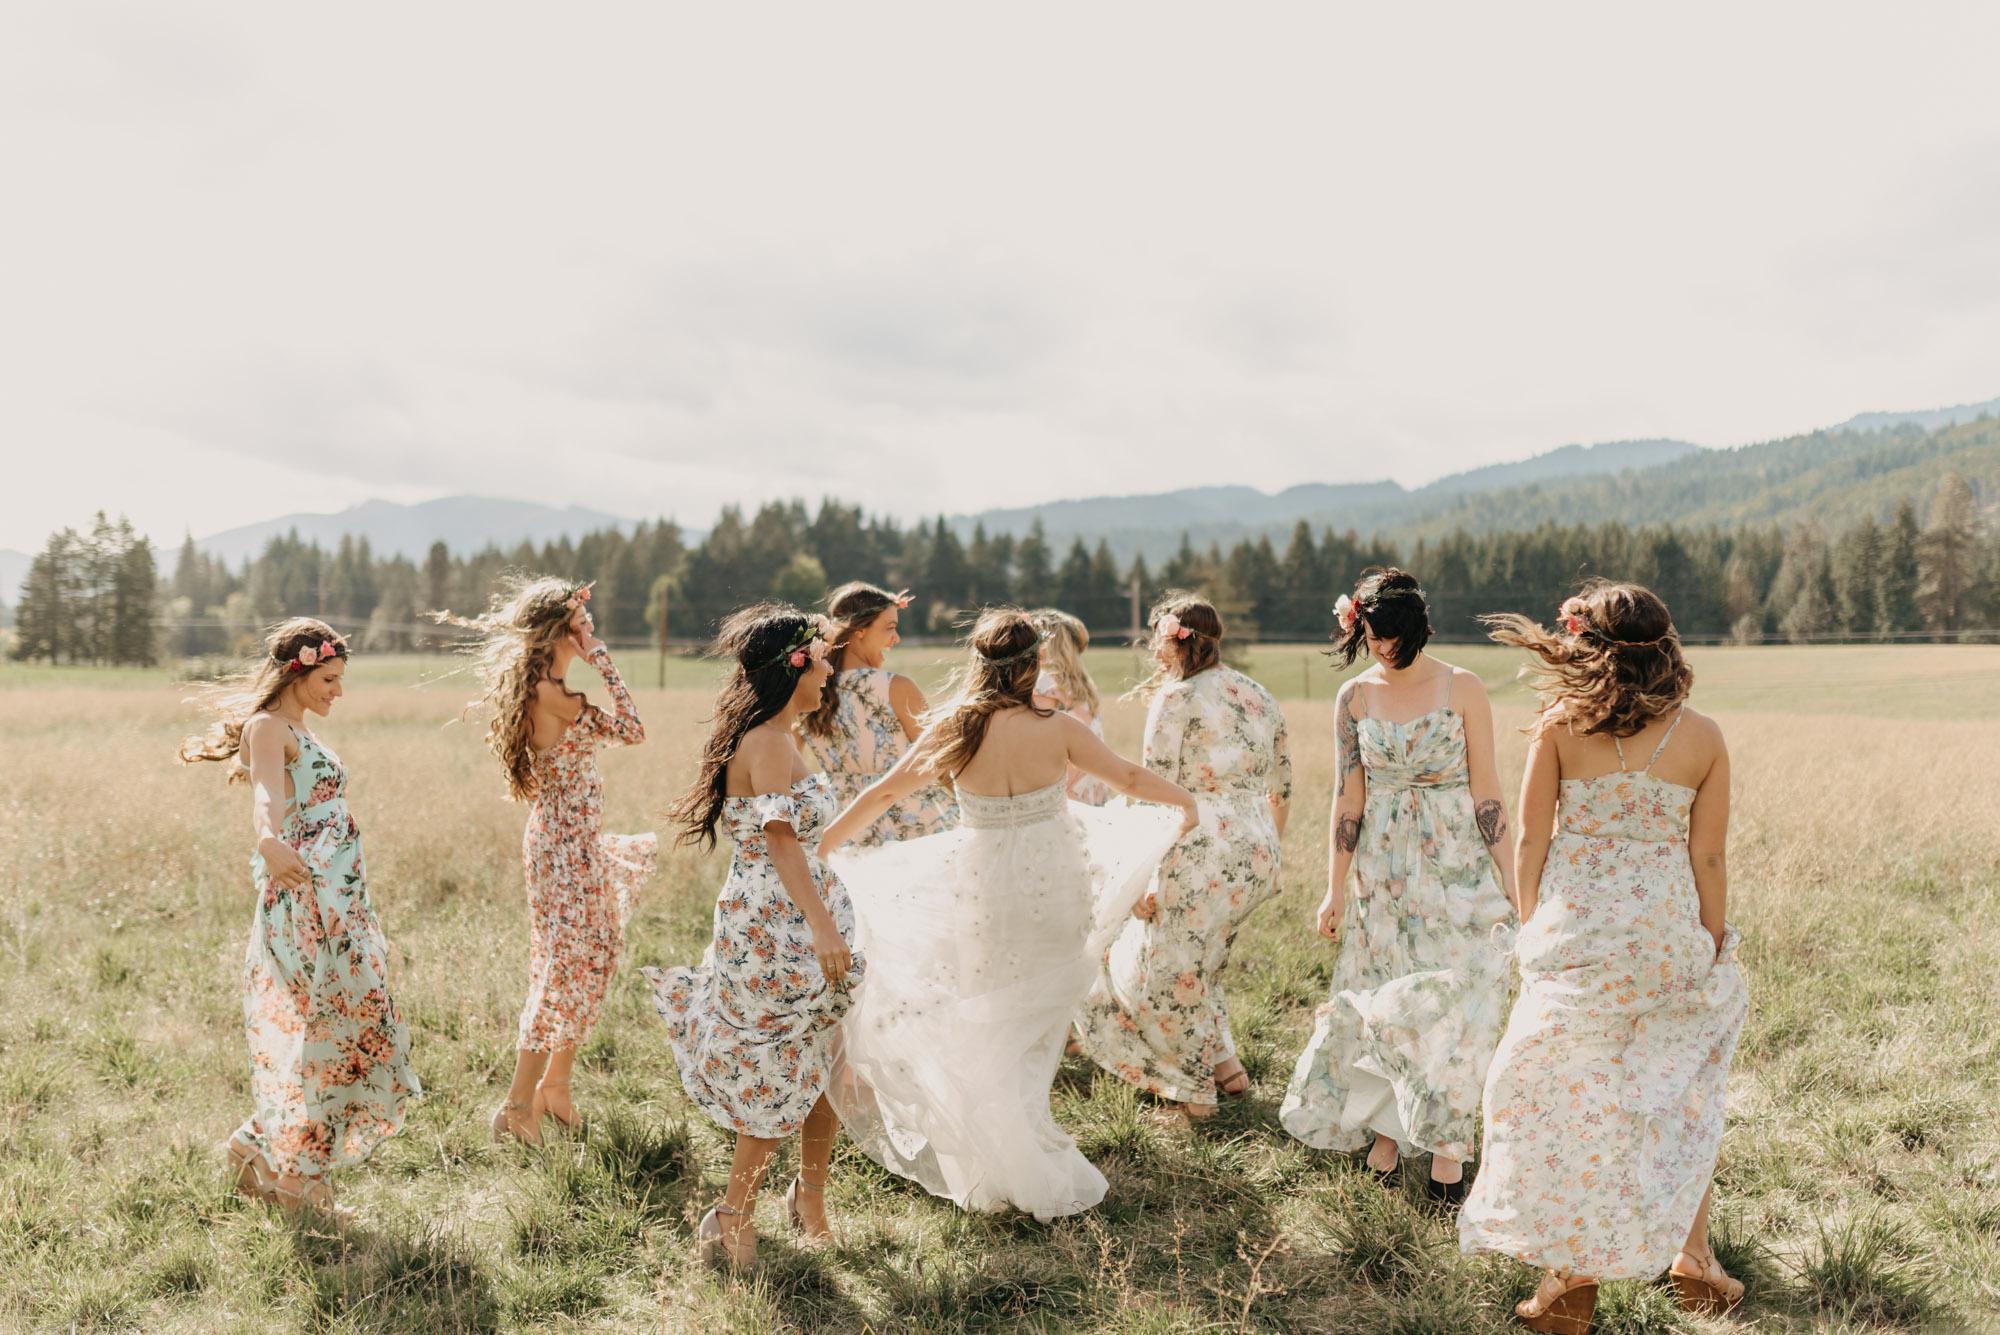 Bridal-Party-Free-People-Flower-Dresses-Washington-Wedding-8576.jpg